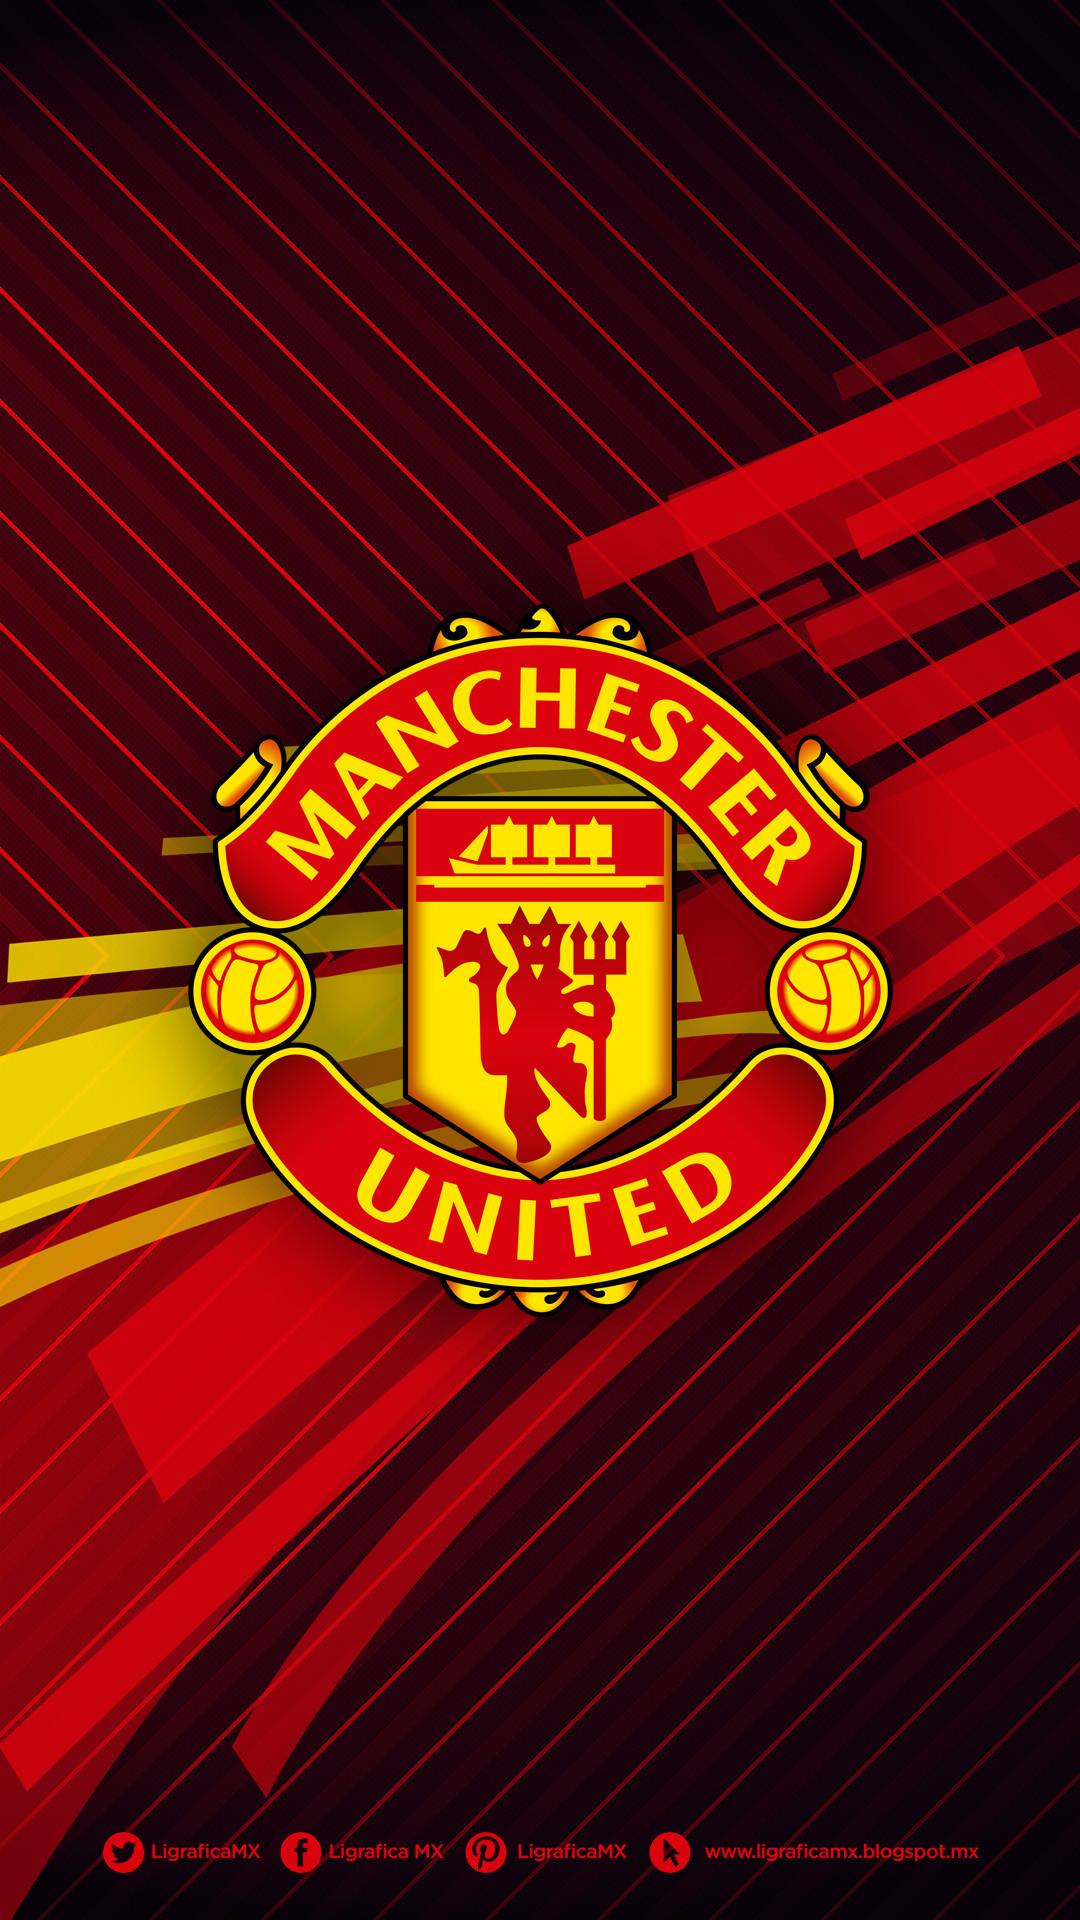 Amazing Man Utd Wallpaper 2017 For Andro Manchester United Wallpaper Mobile 1080x1920 Download Hd Wallpaper Wallpapertip